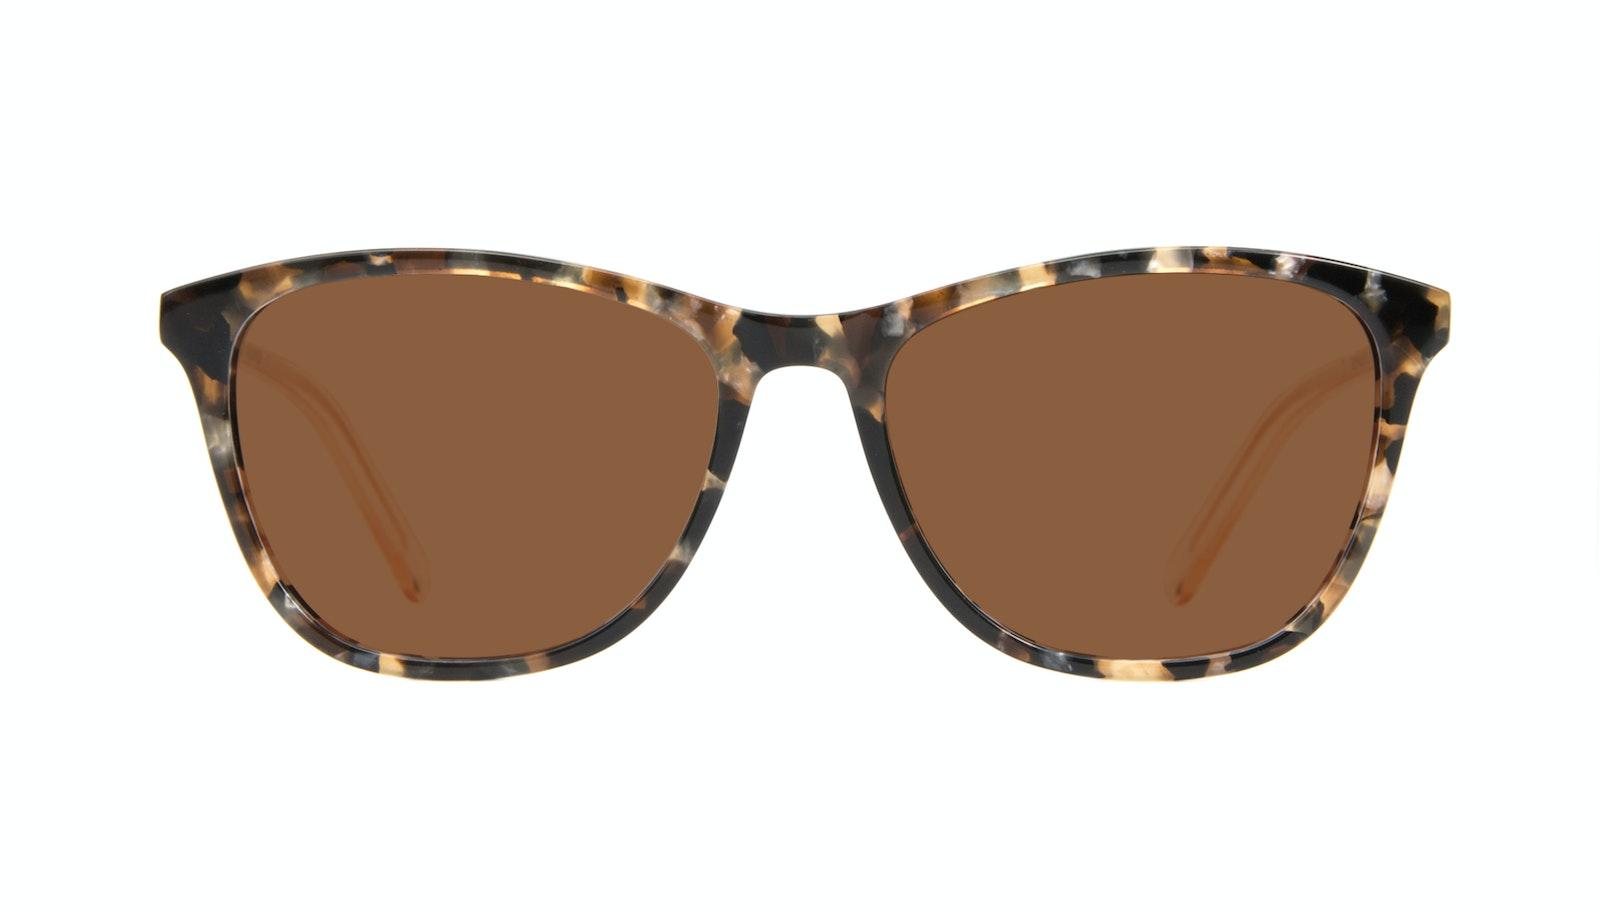 Affordable Fashion Glasses Rectangle Sunglasses Women Folk Gold Flake